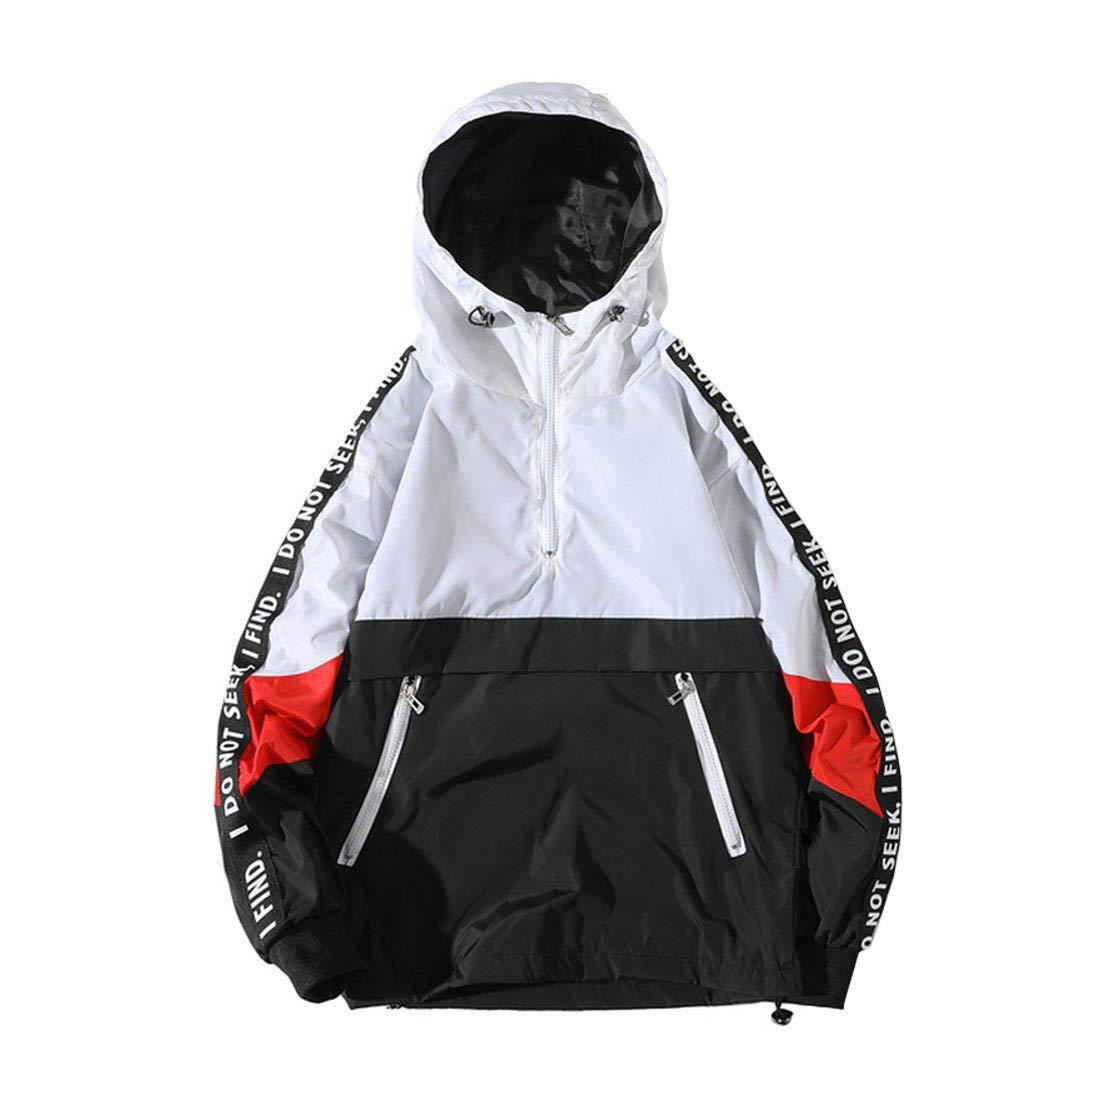 ONTTNO Men's Casual Hooded Lightweight Windbreaker Jacket (Small, White) by ONTTNO